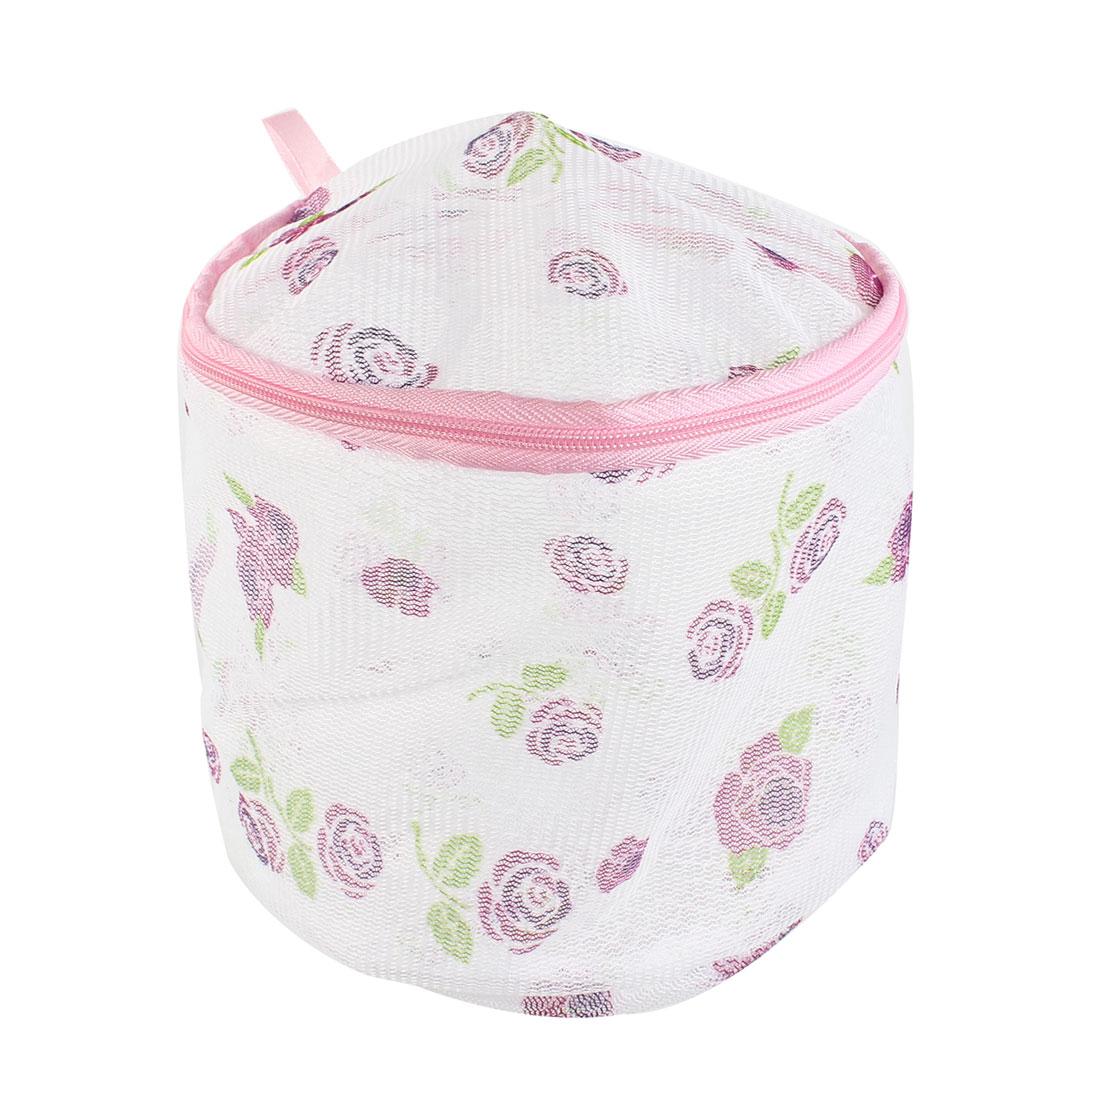 Rose Pattern Zipper Closure Mesh Nylon Laundry Underwear Washing Bag